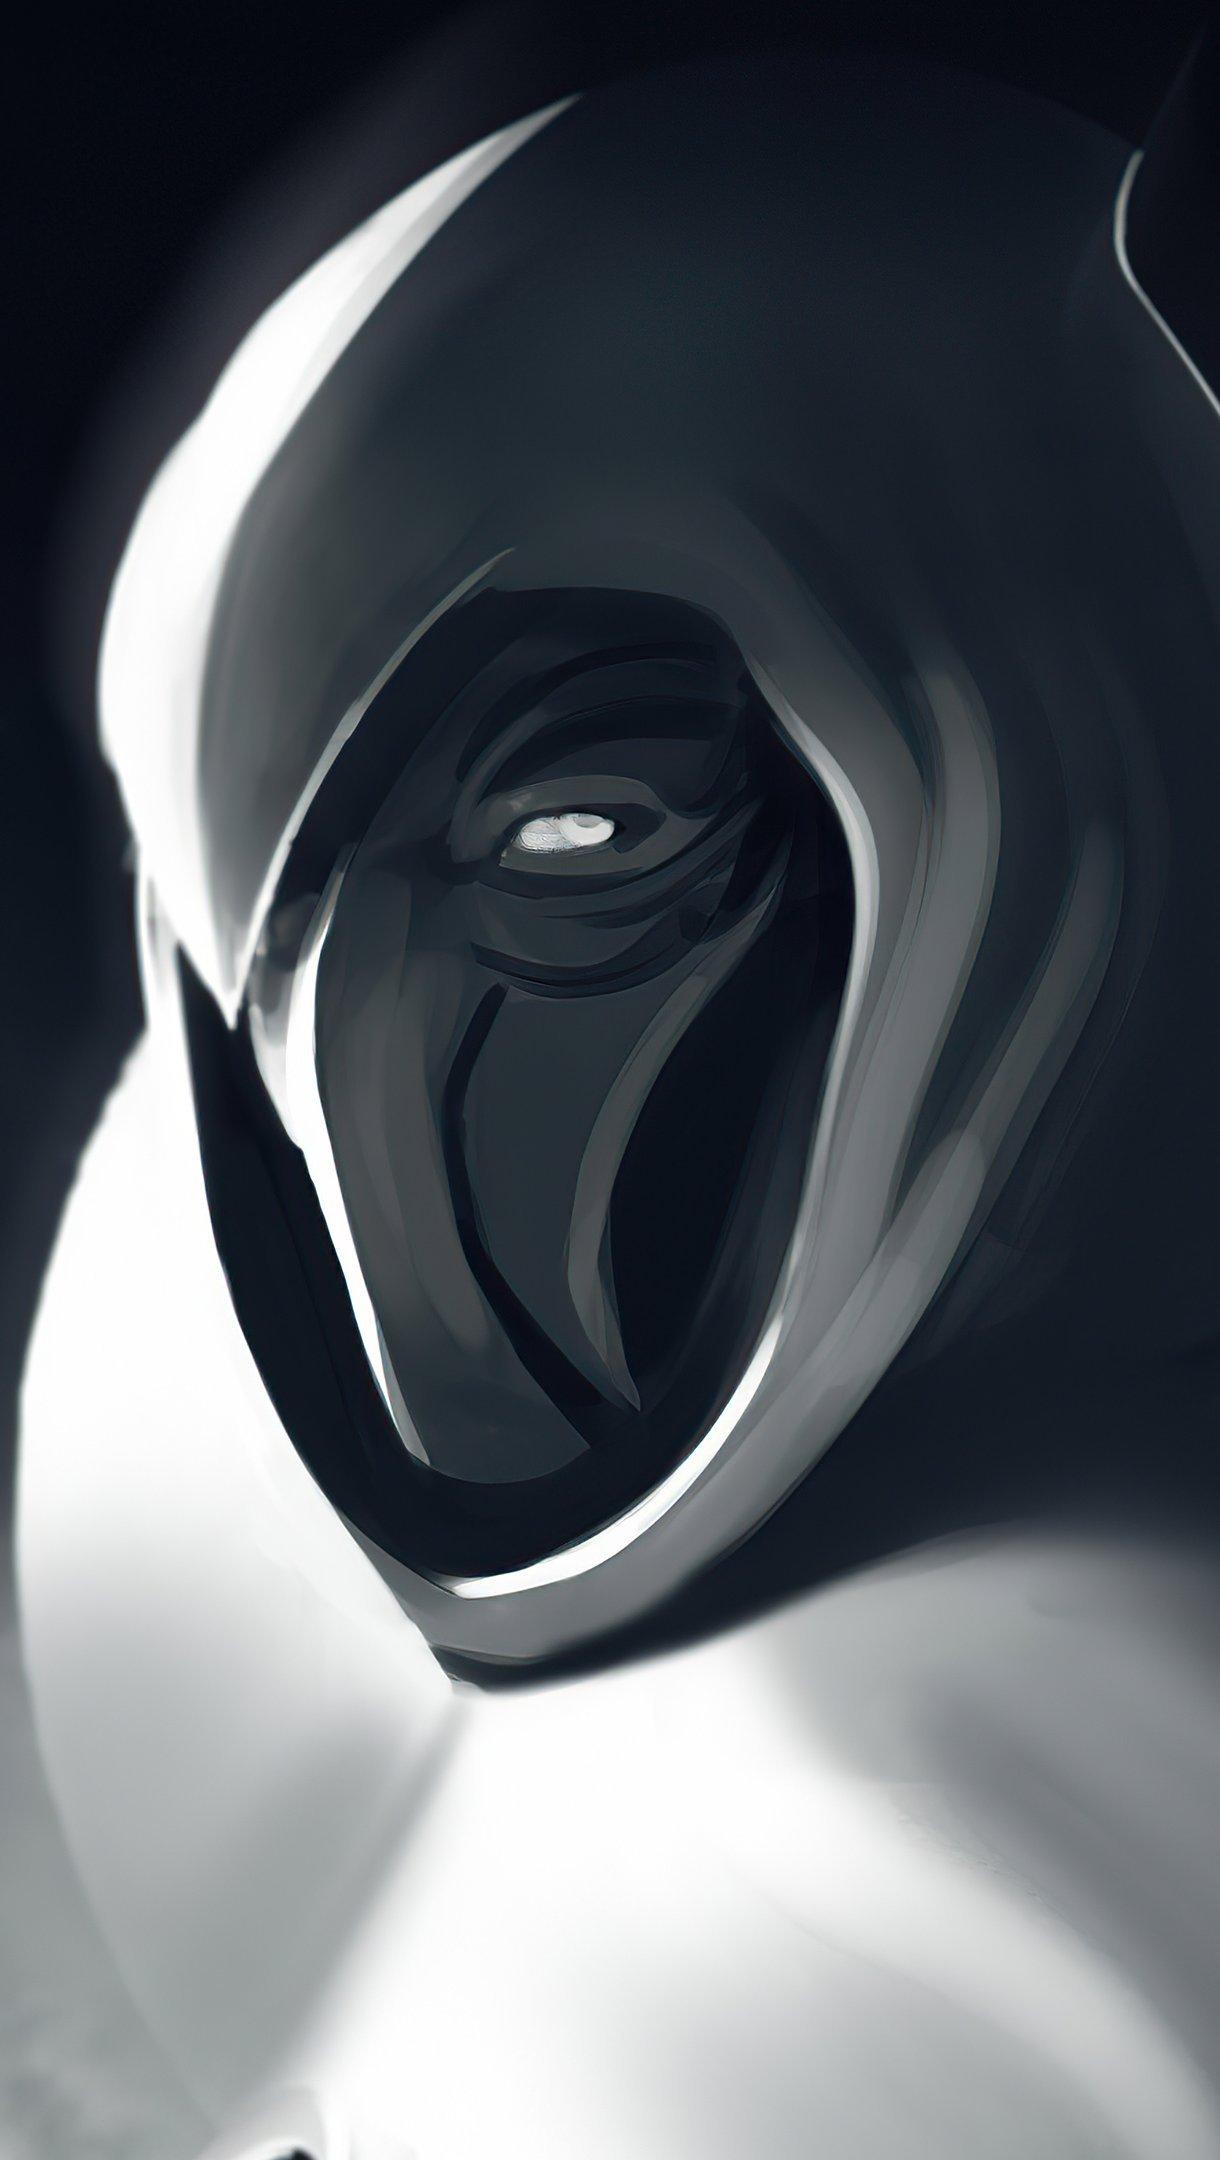 Wallpaper Moon Knight Monochrome Vertical